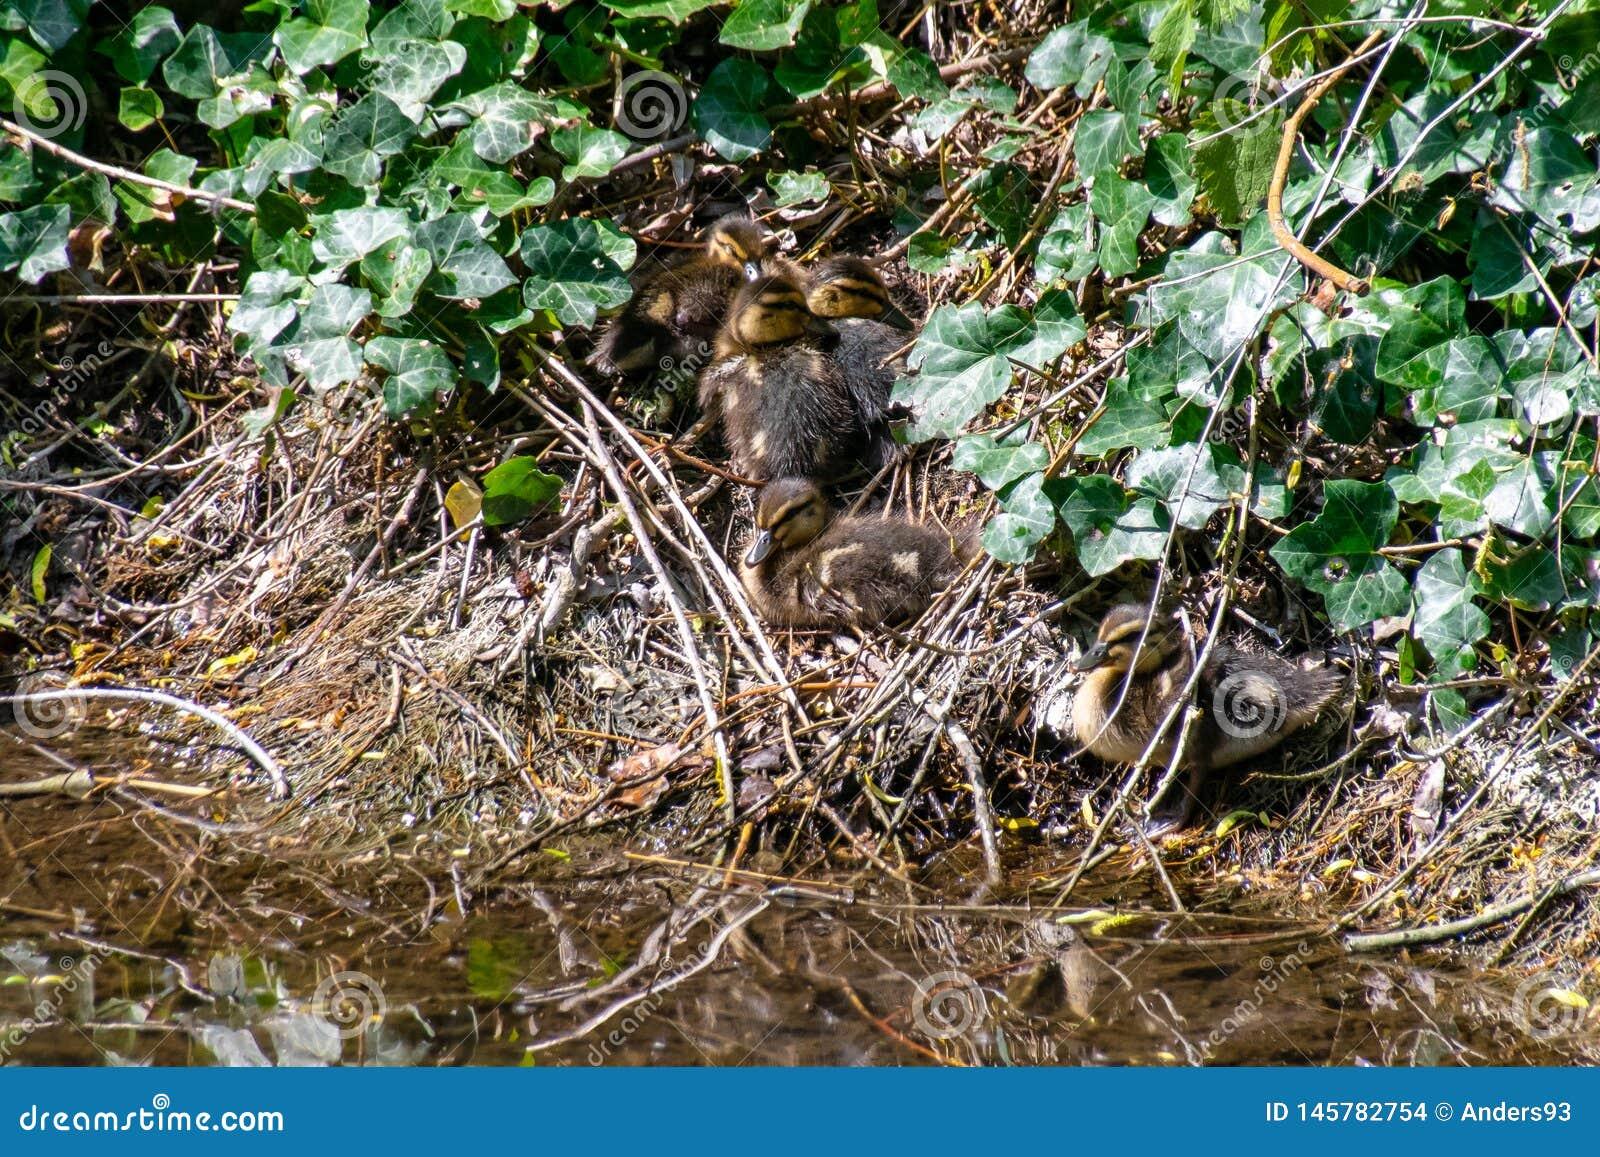 Cluster of mallard ducklings huddled together on the riverbank hidden amongst the vegetation